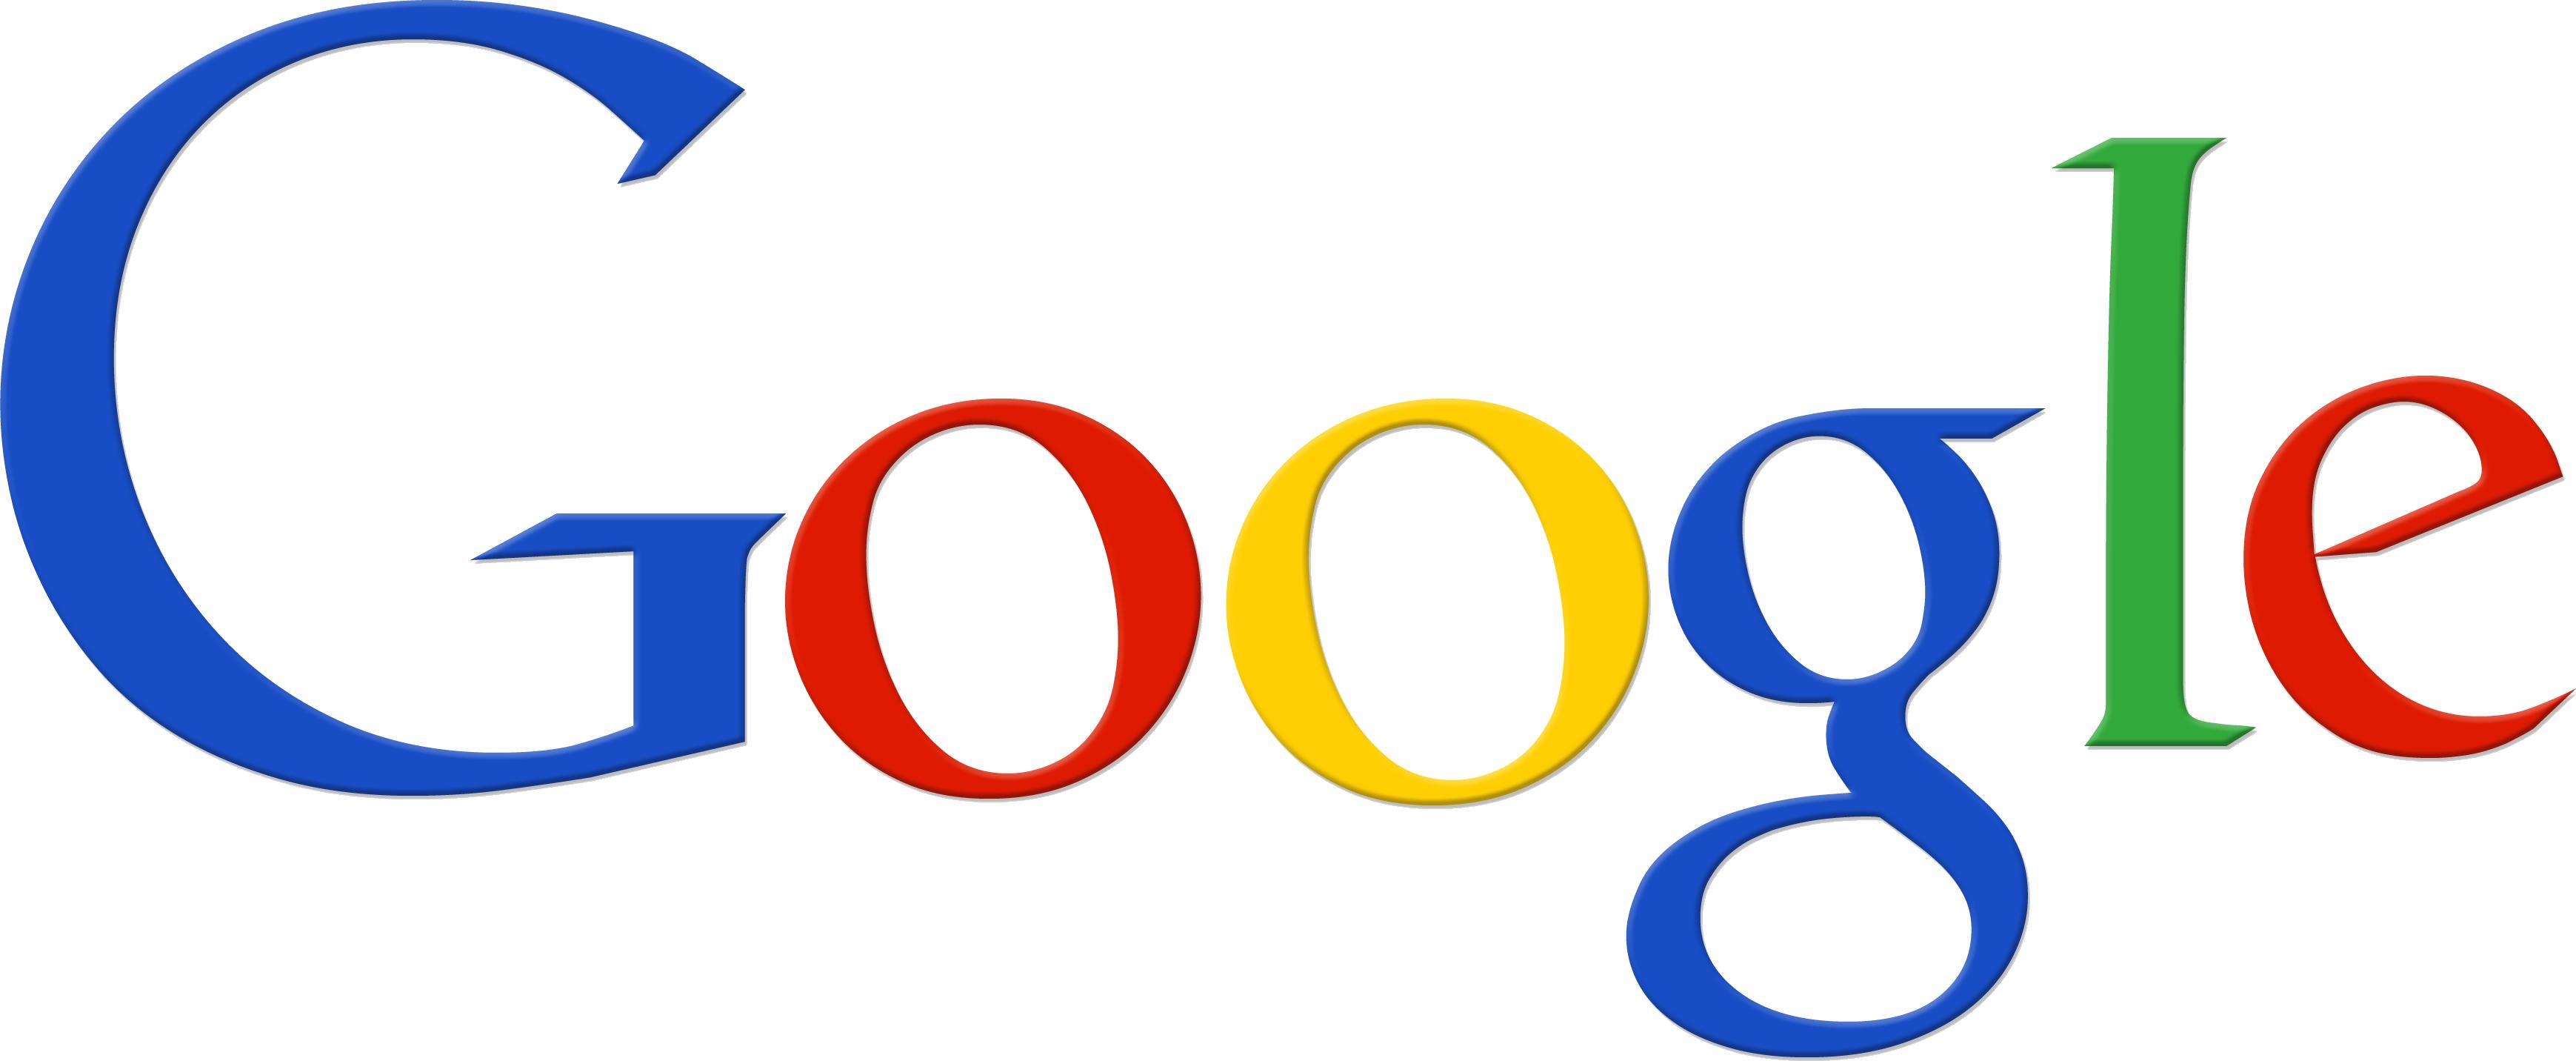 google_PNG19625